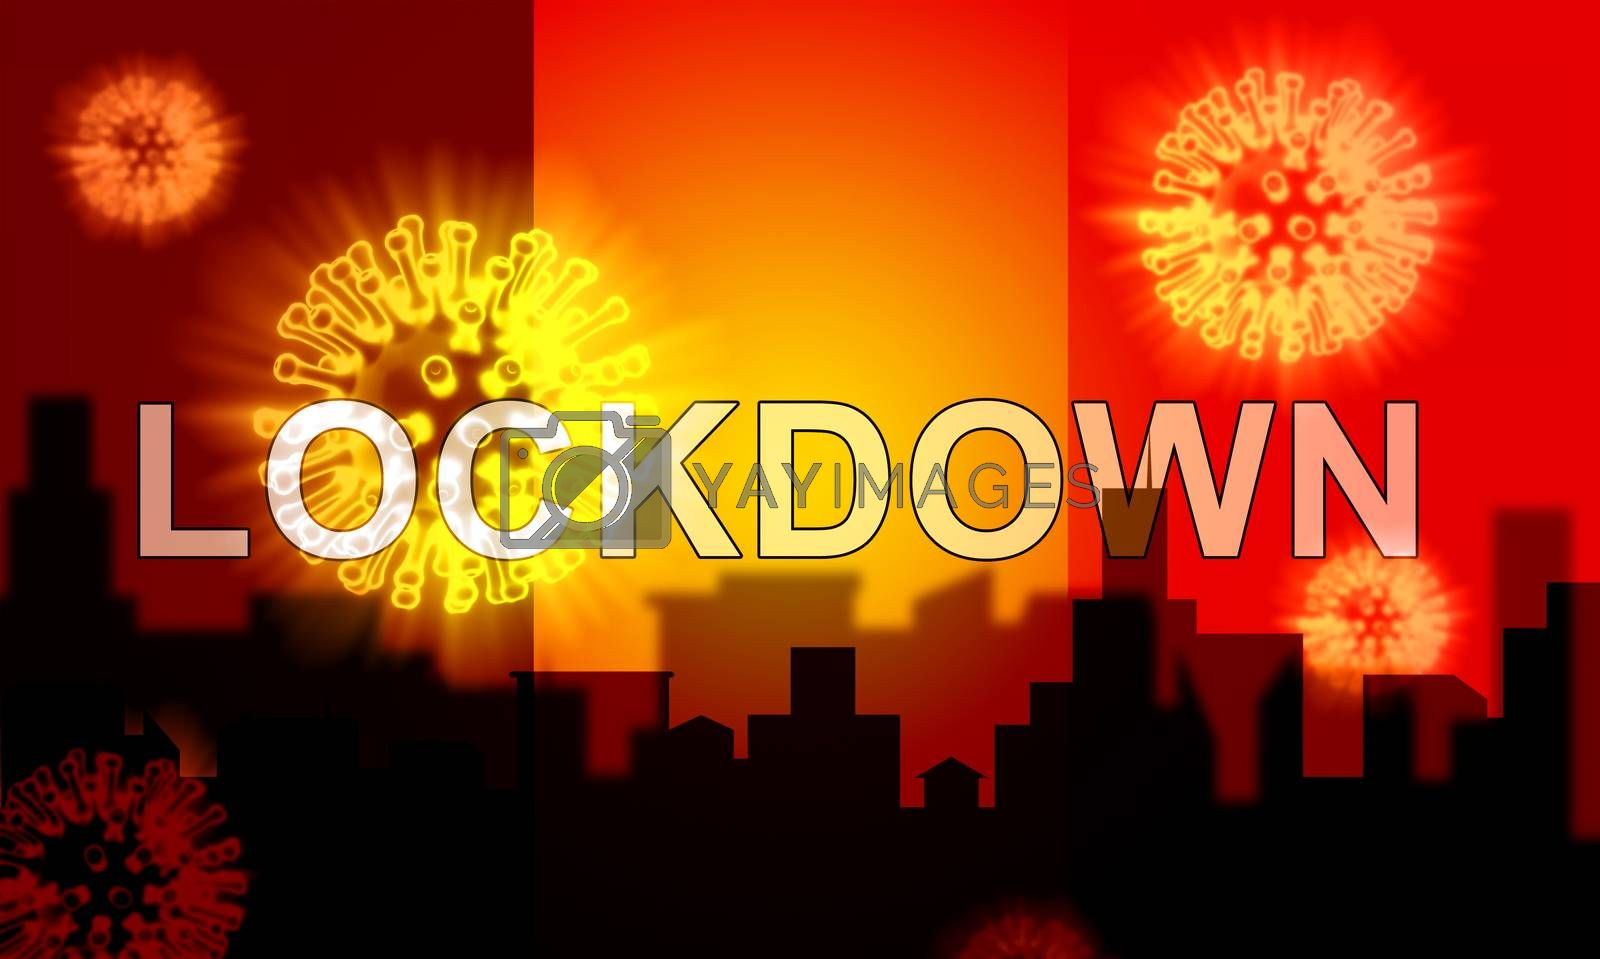 Belgium lockdown to control coronavirus epidemic or outbreak. Covid 19 belgian restriction to lock down disease infection - 3d Illustration